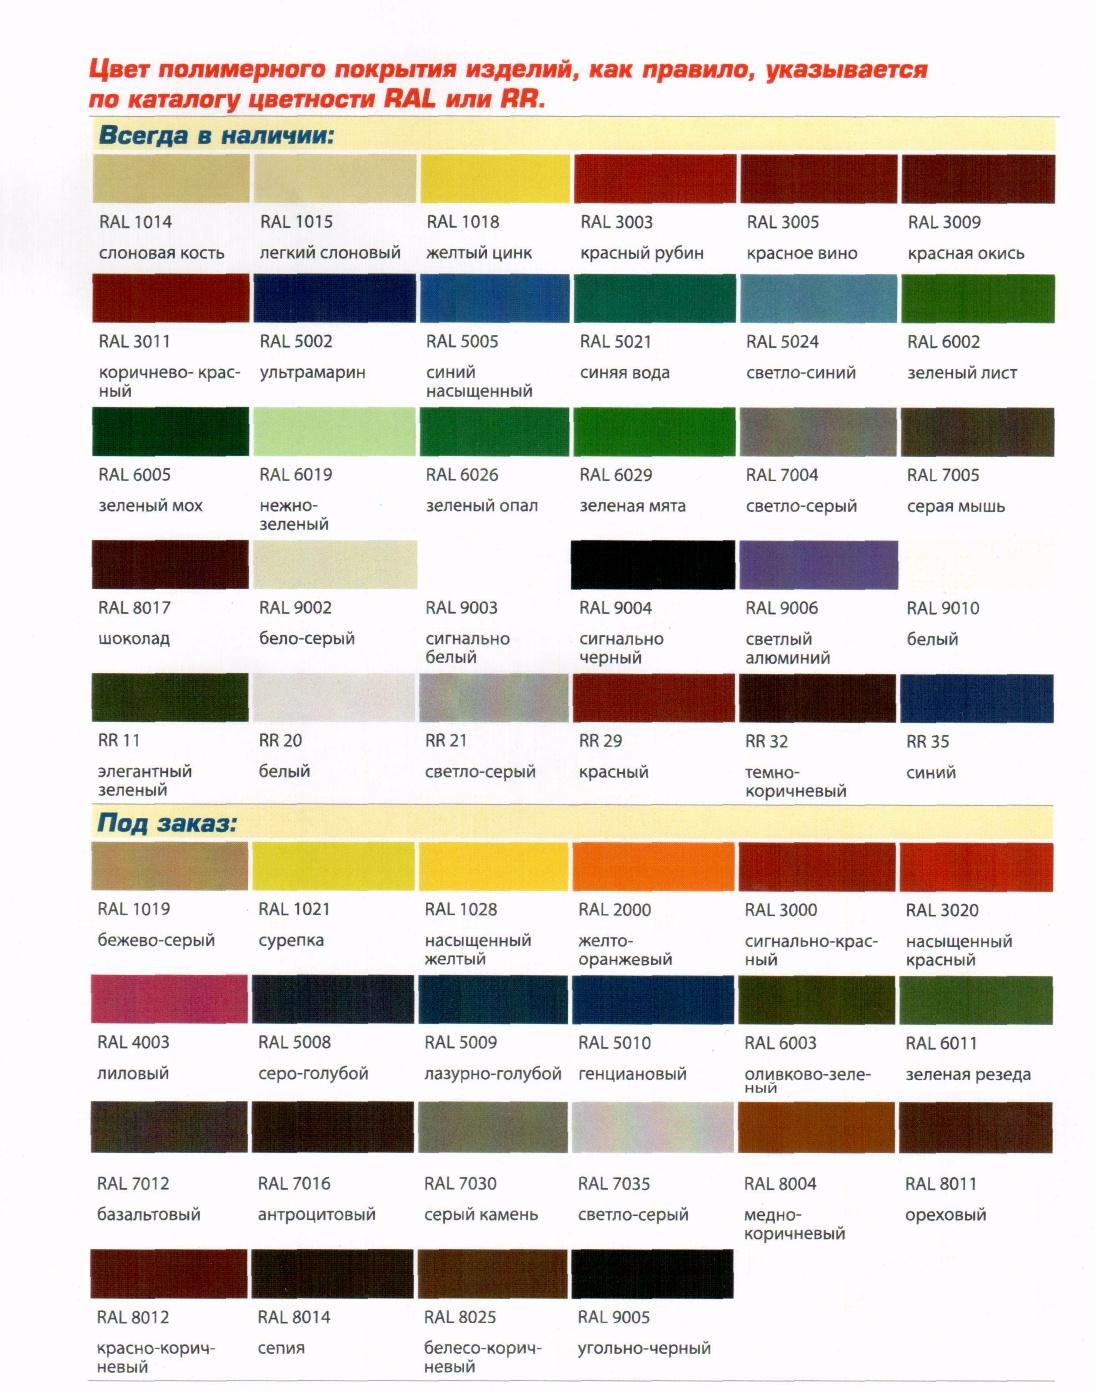 Список всех названий цветов